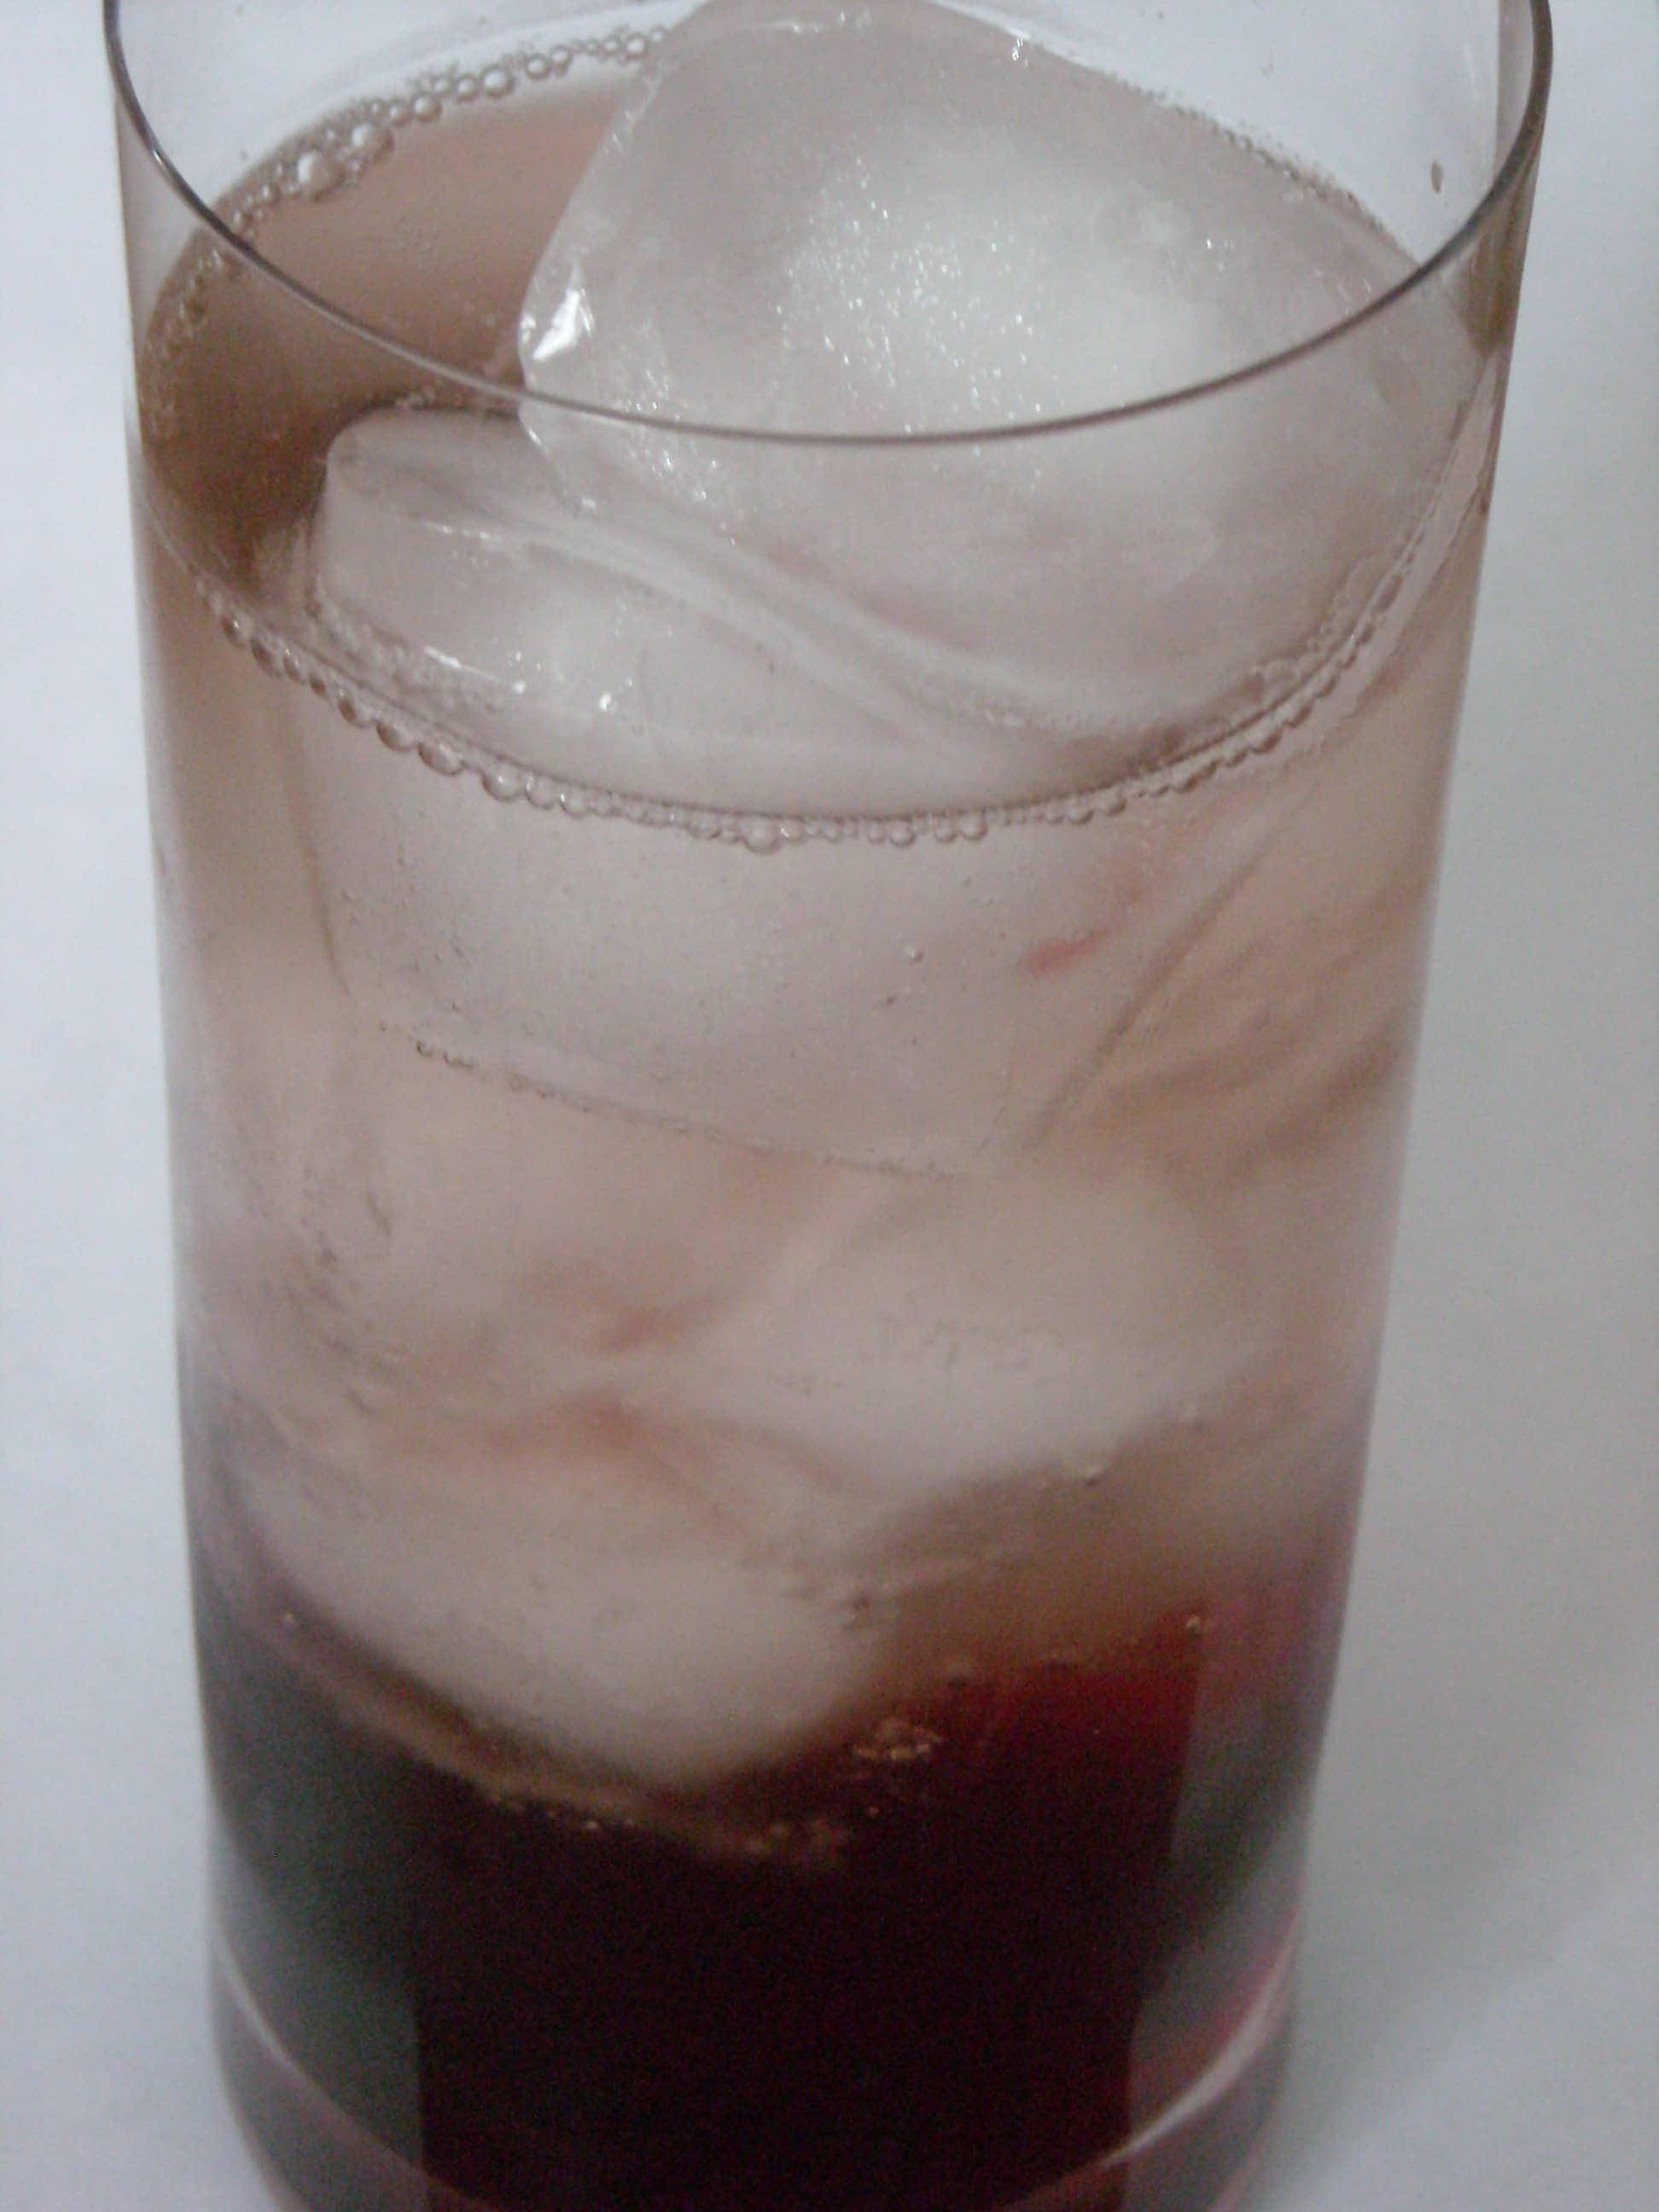 Homemade Grenadine and Boozy Fizzy Soda by Nutmeg Nanny